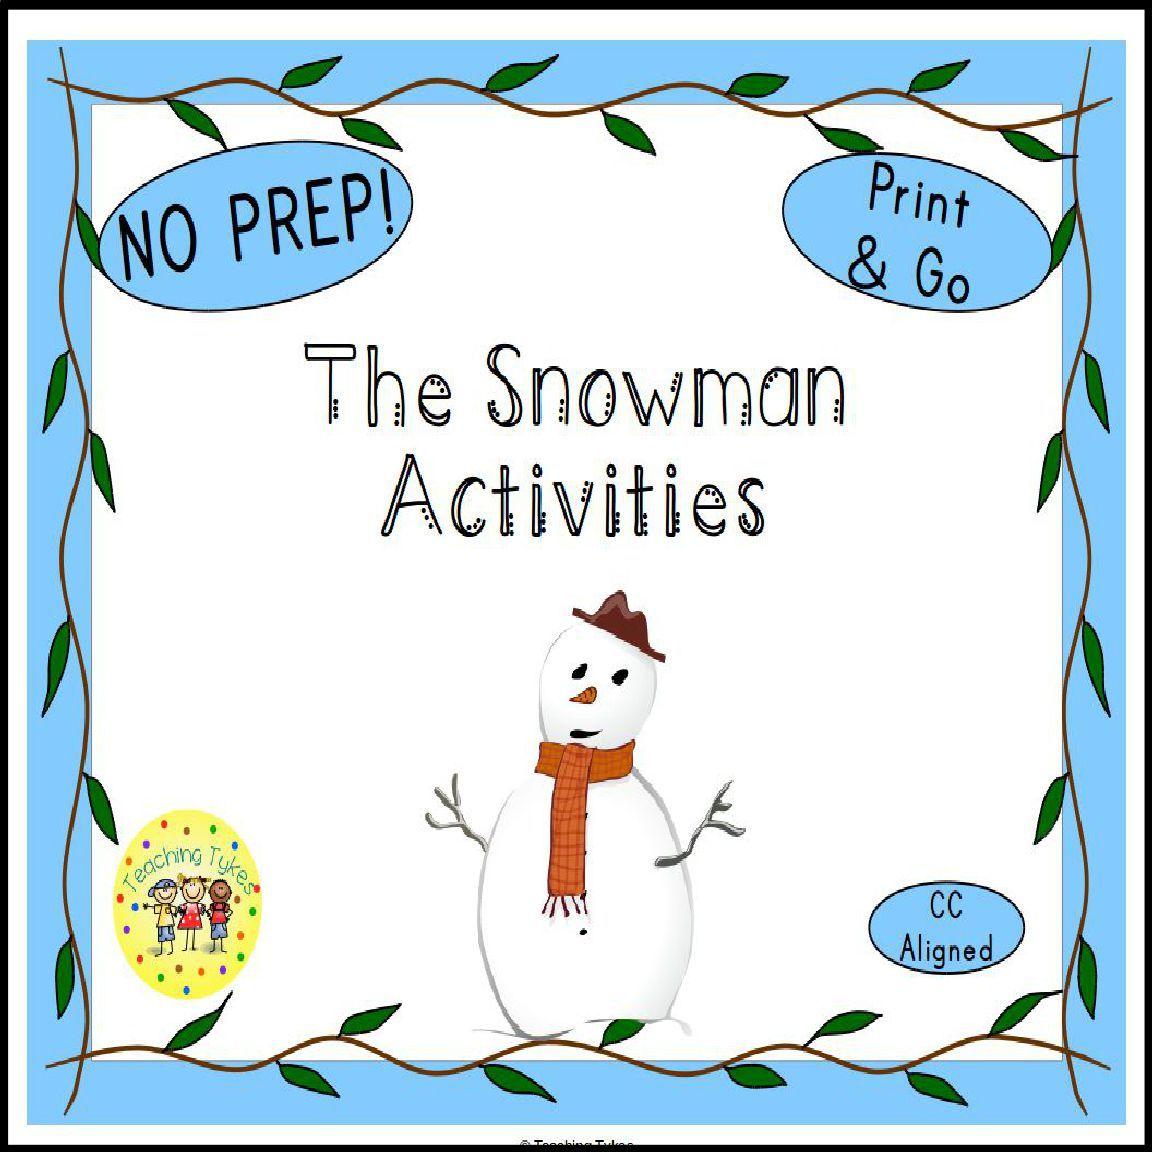 The Snowman Activities